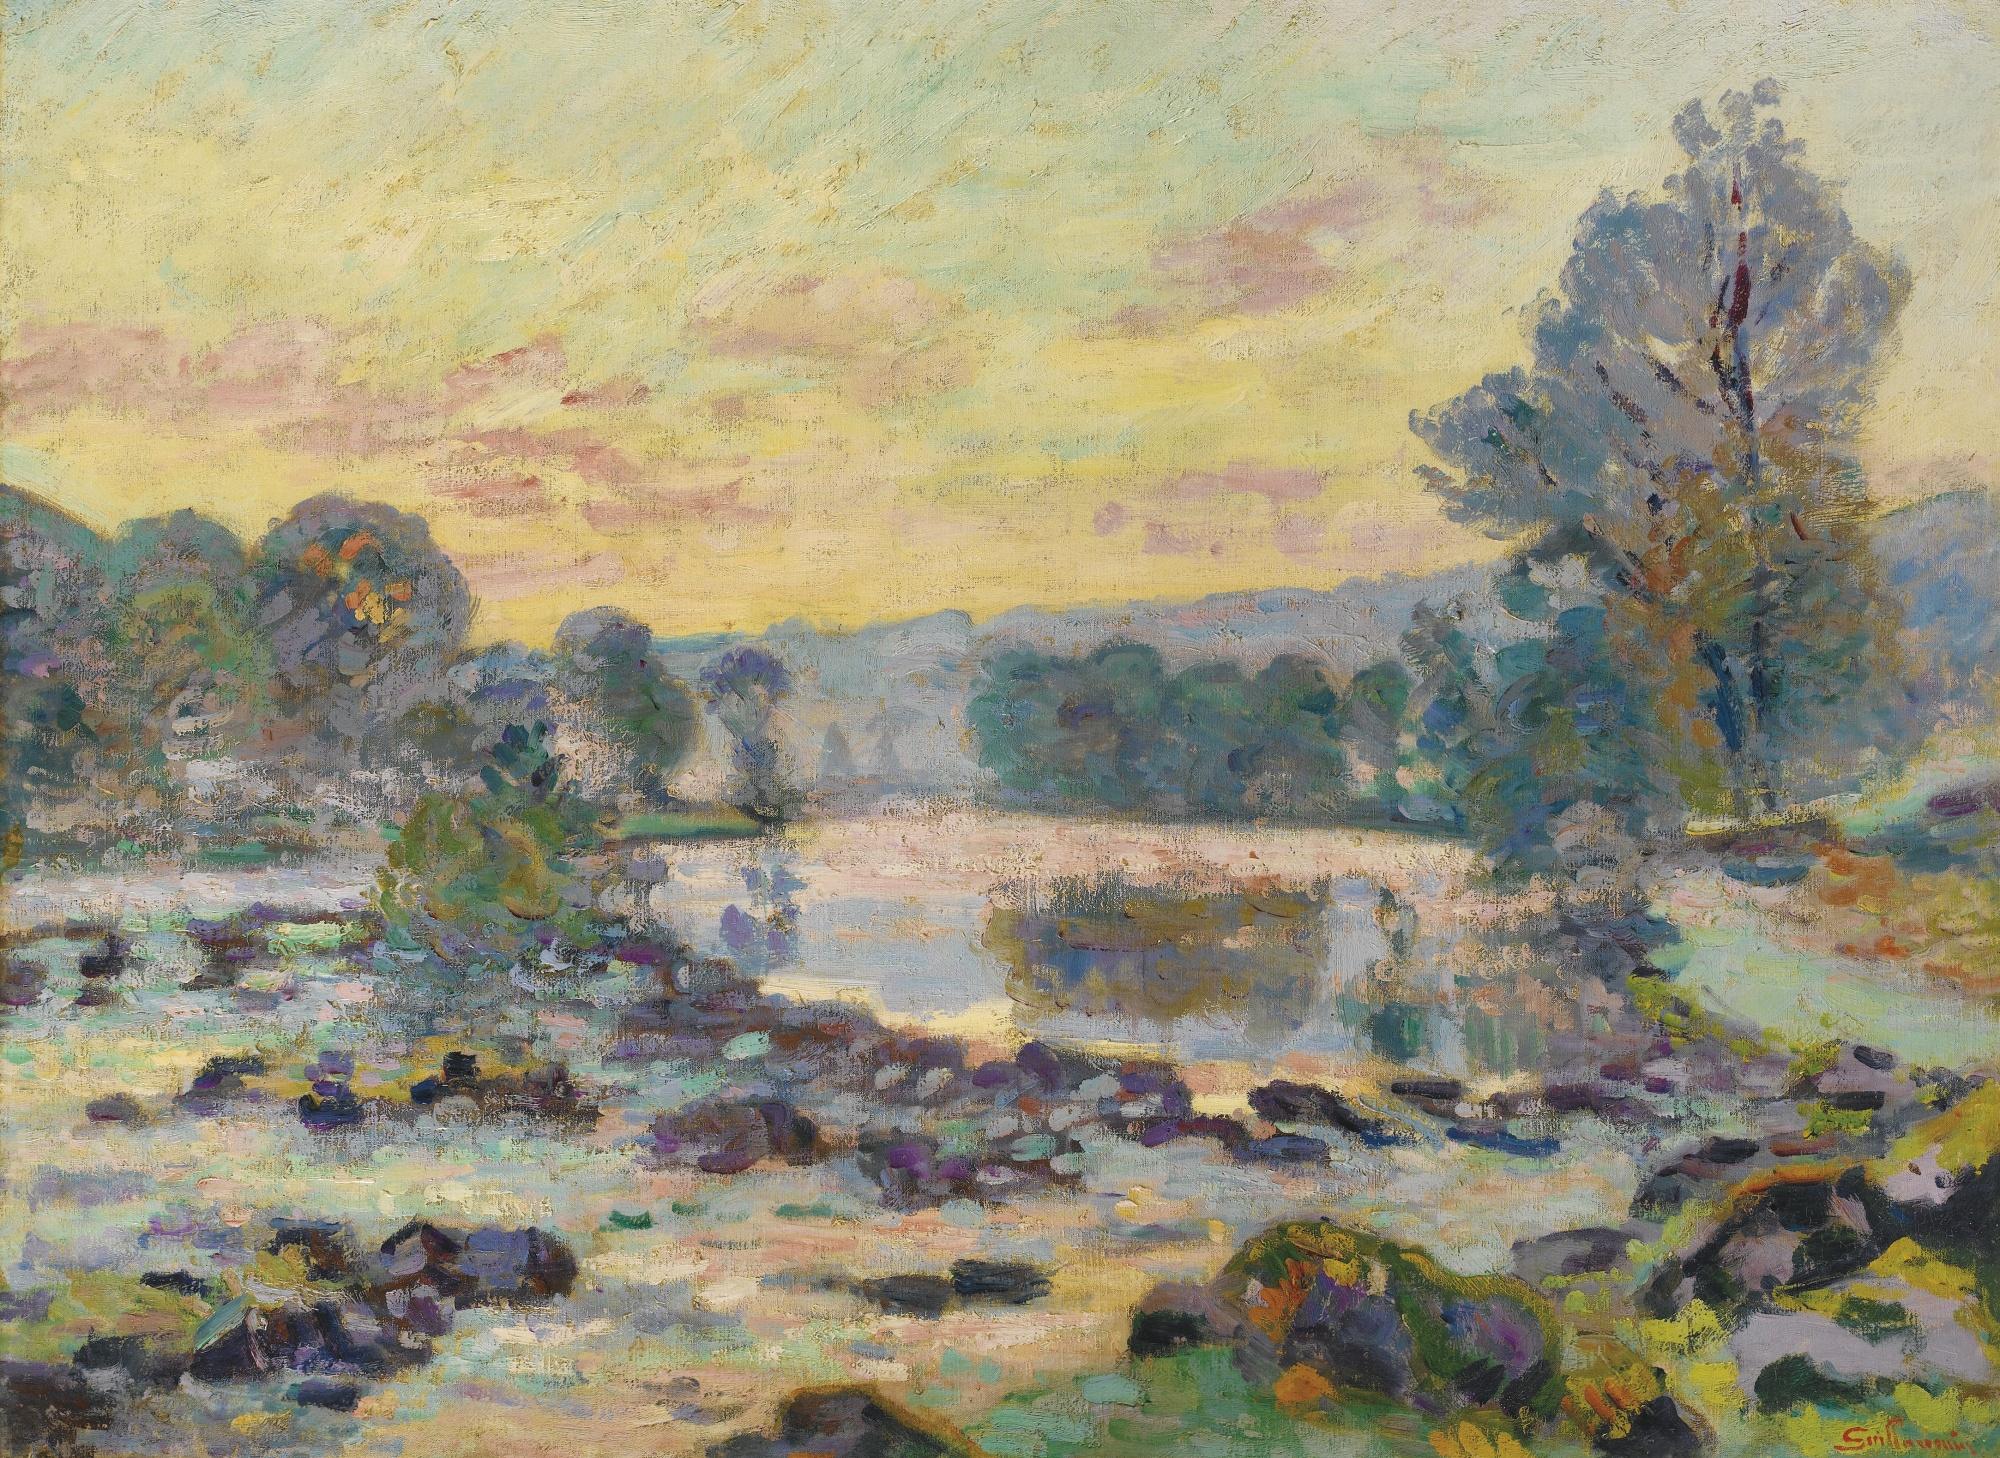 Jean-Baptiste Armand Guillaumin-Le Barrage De Genetin, Crozant-1907